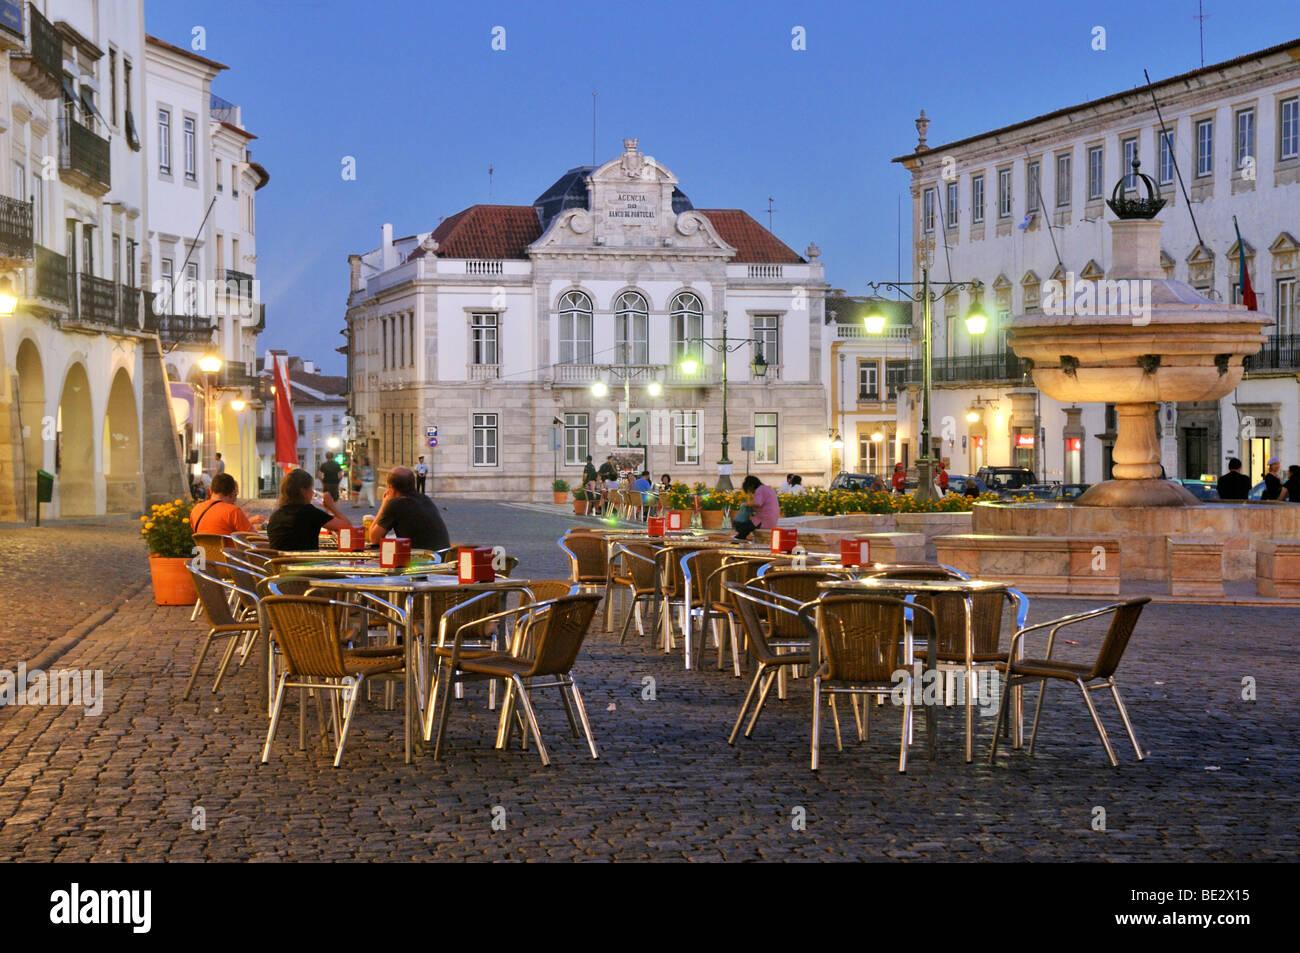 Outdoor cafe on the Praca do Giraldo square at night, Evora, UNESCO World Heritage Site, Alentejo, Portugal, Europe Stock Photo